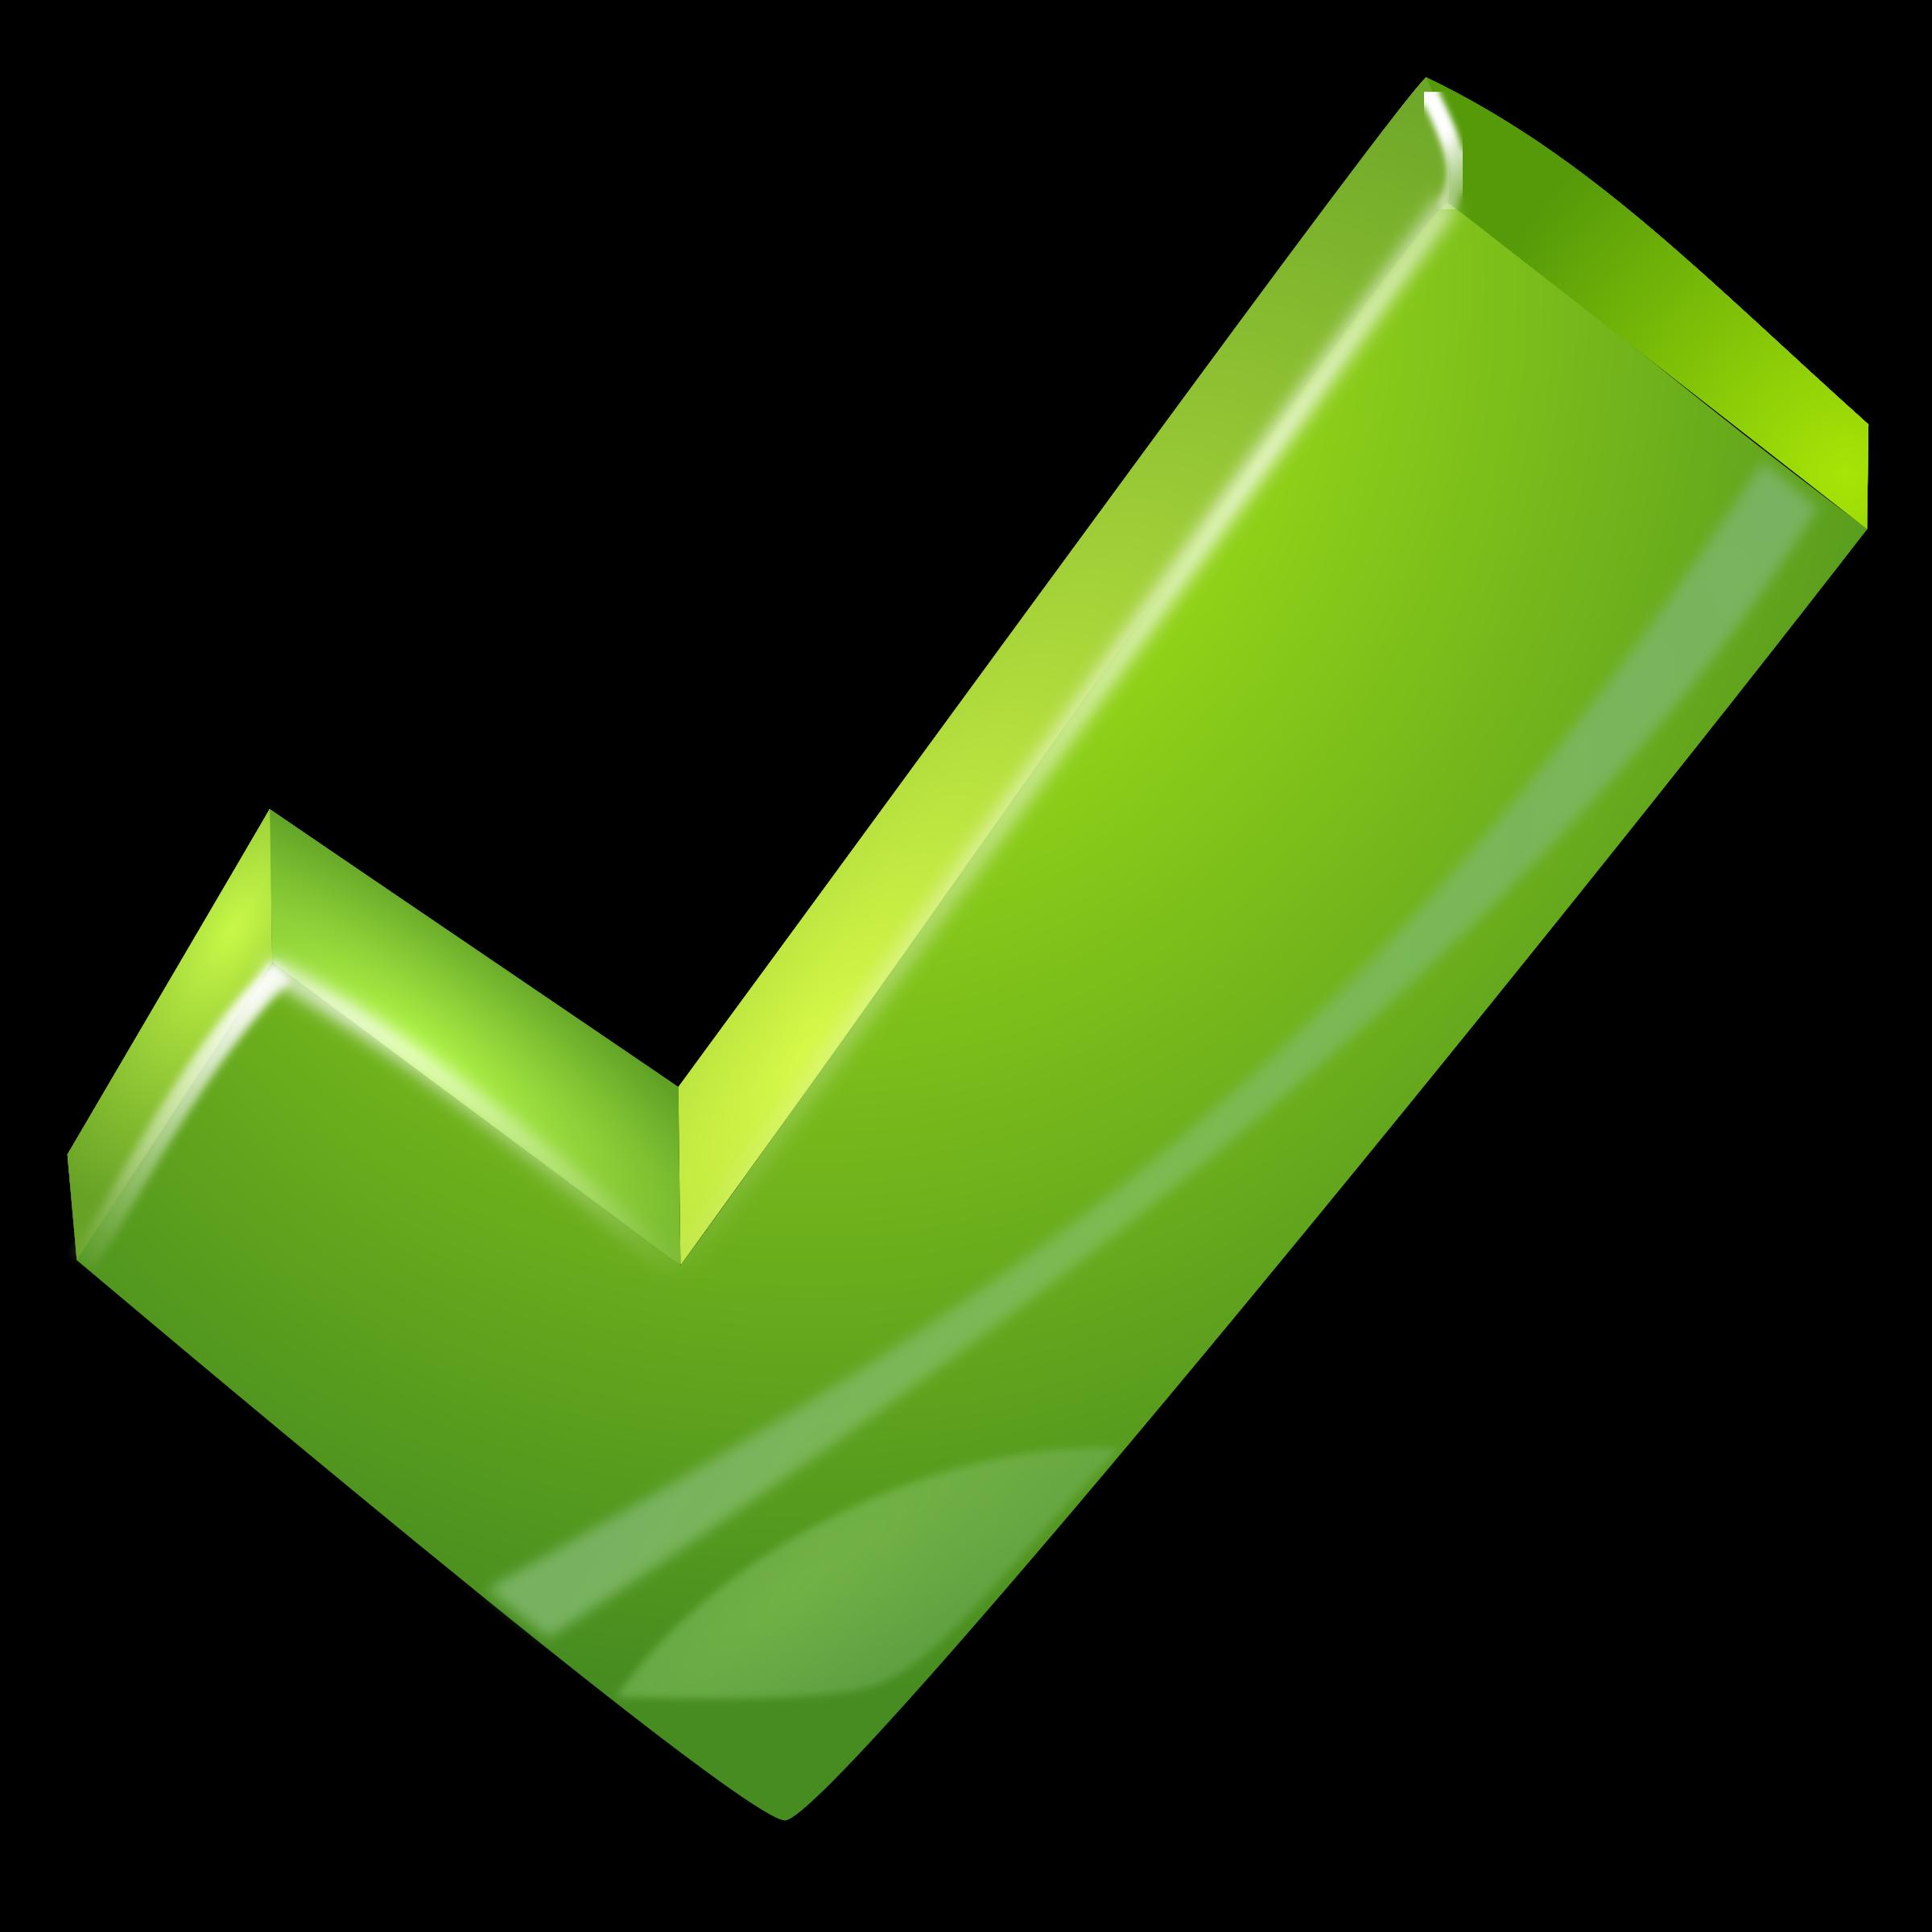 Tick big image png. Checkmark clipart green